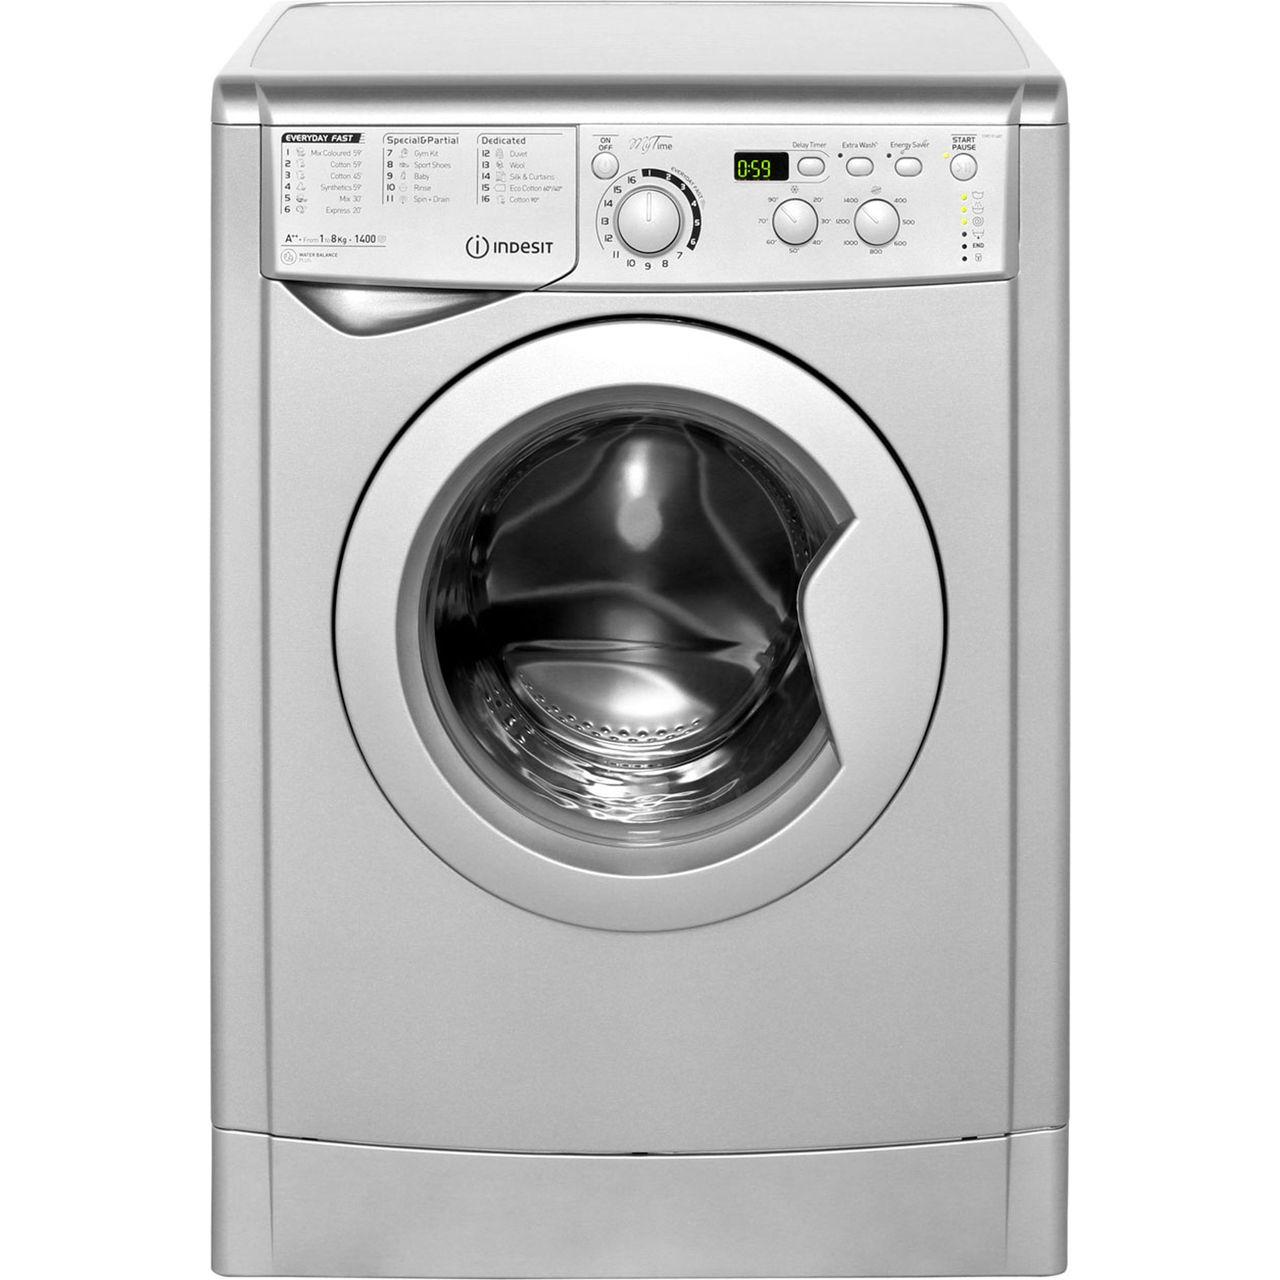 indesit my time ewd81482s washing machine silver. Black Bedroom Furniture Sets. Home Design Ideas